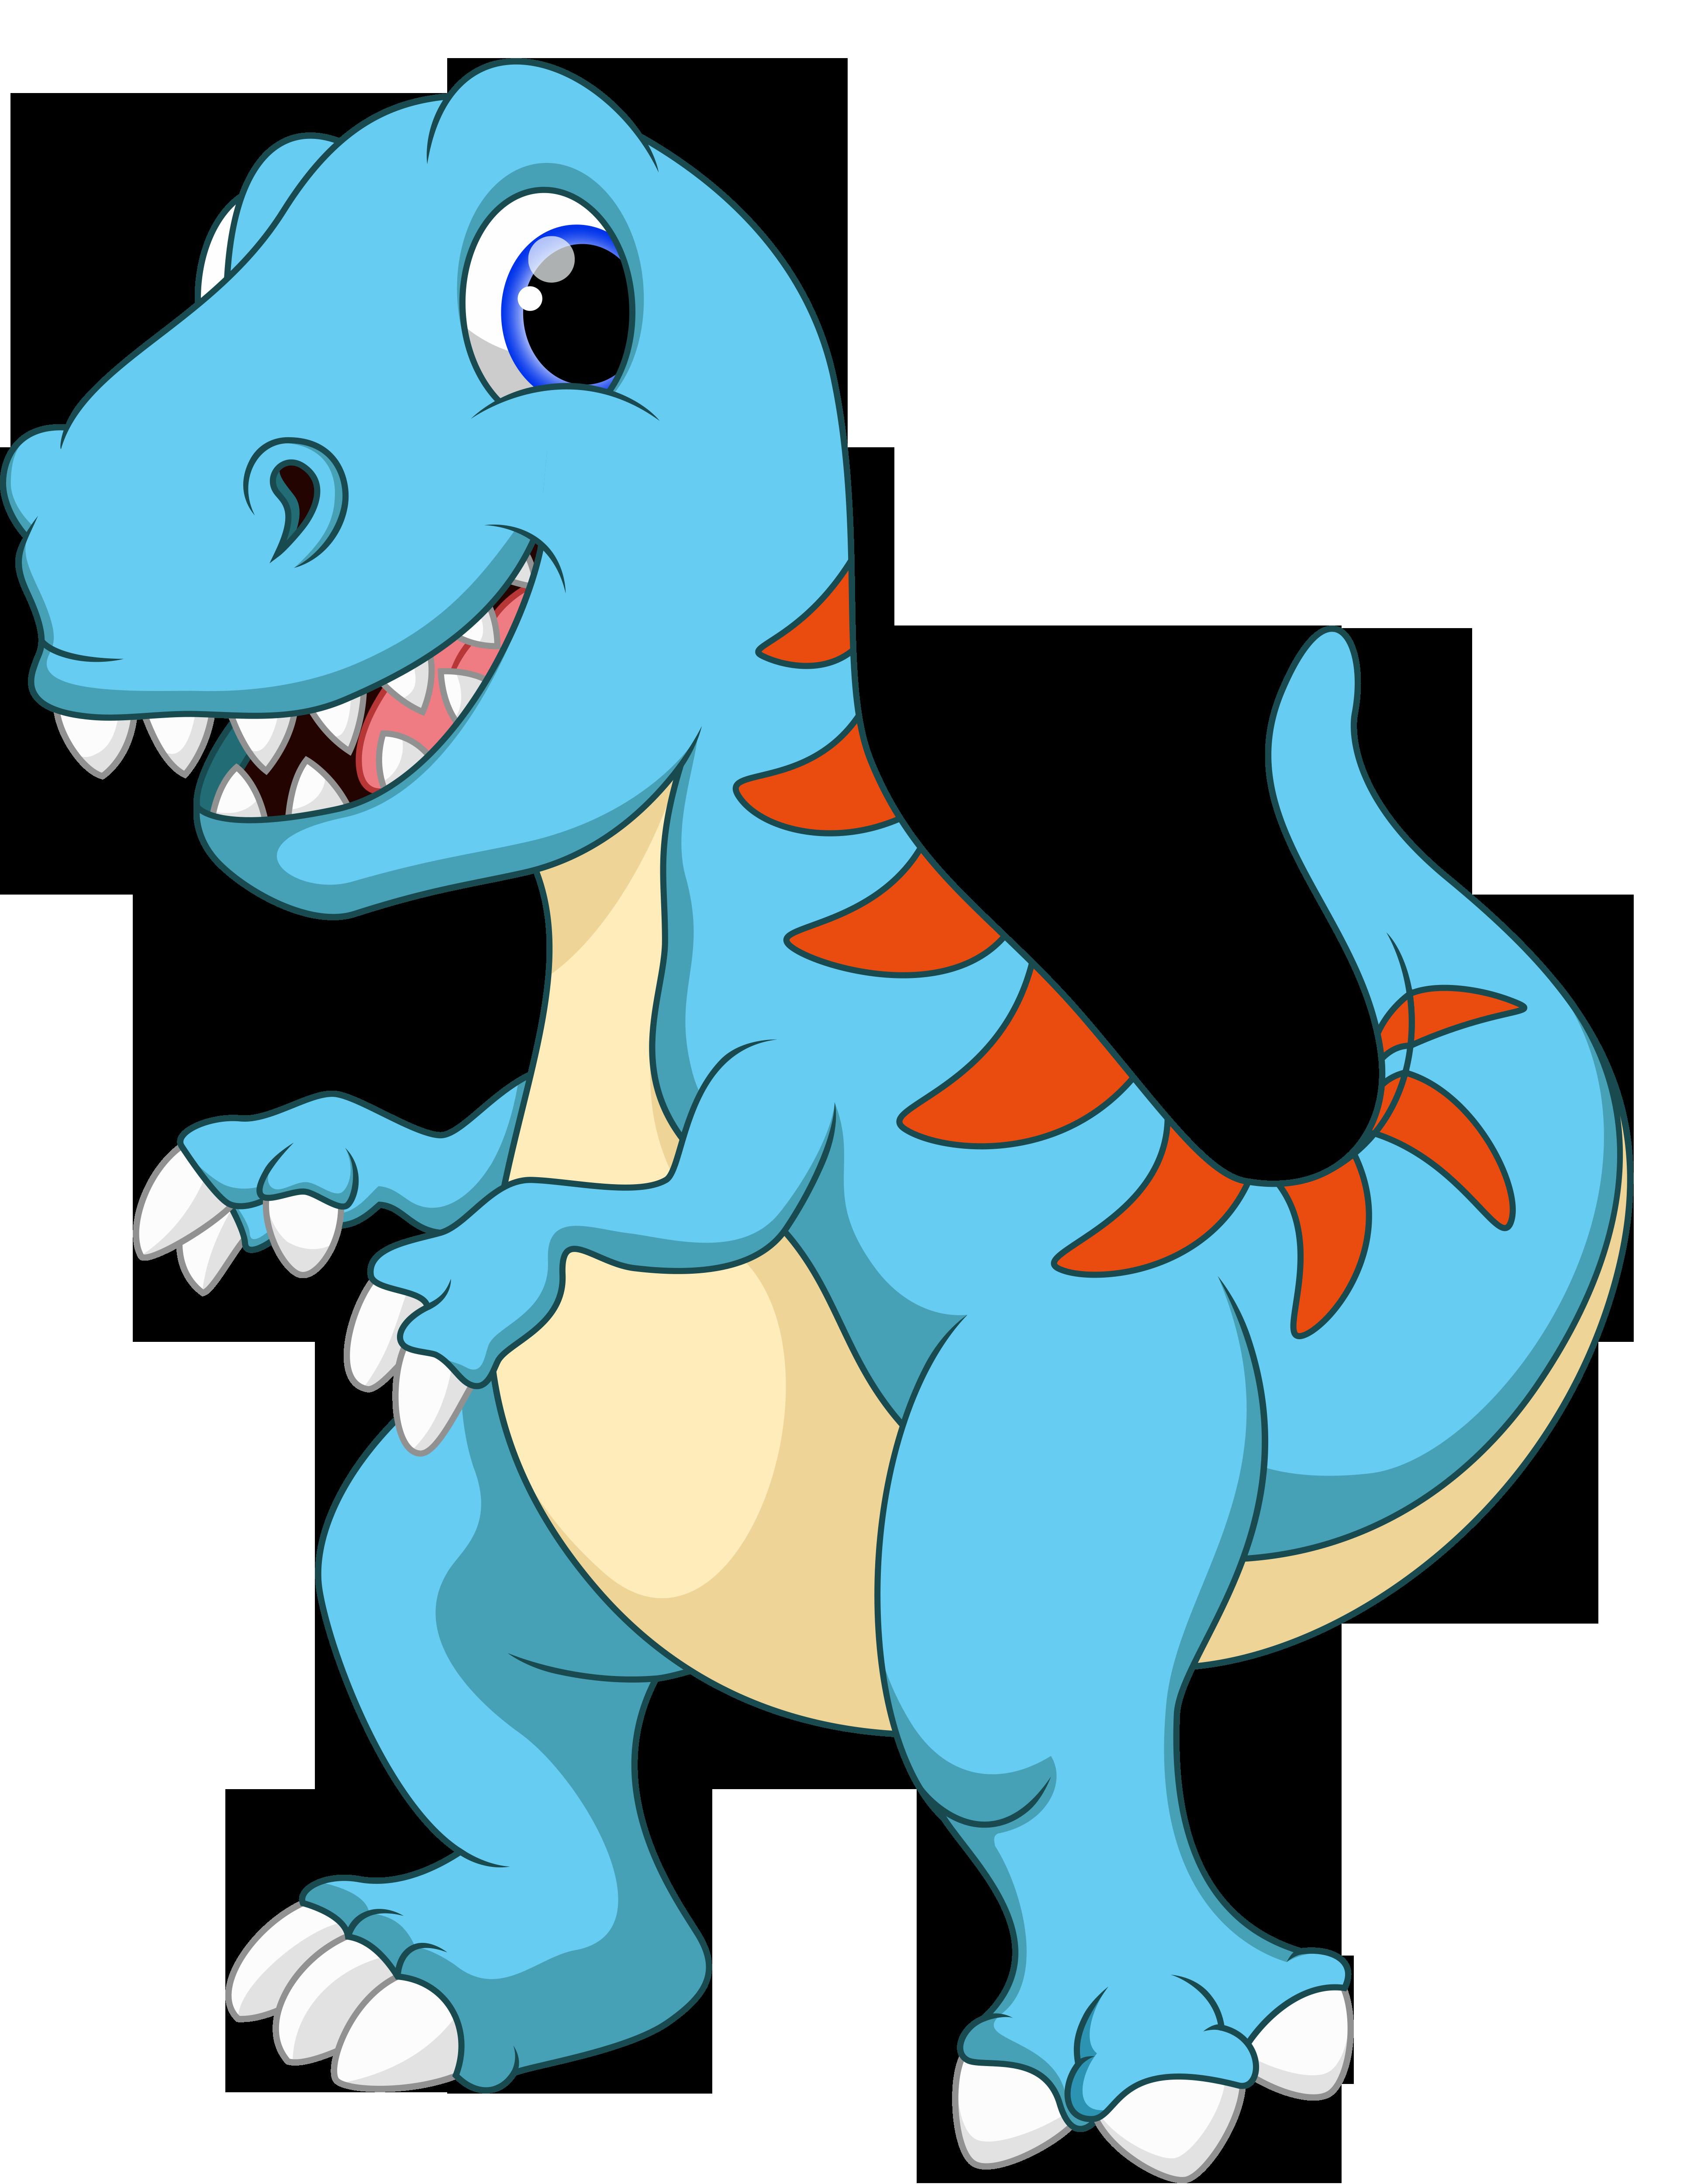 0 11b6b2 32abbac1 Orig 3879 5000 Imagenes De Dinosaurios Animados Imagenes De Dinosaurios Infantiles Dinosaurio Rex Dibujo